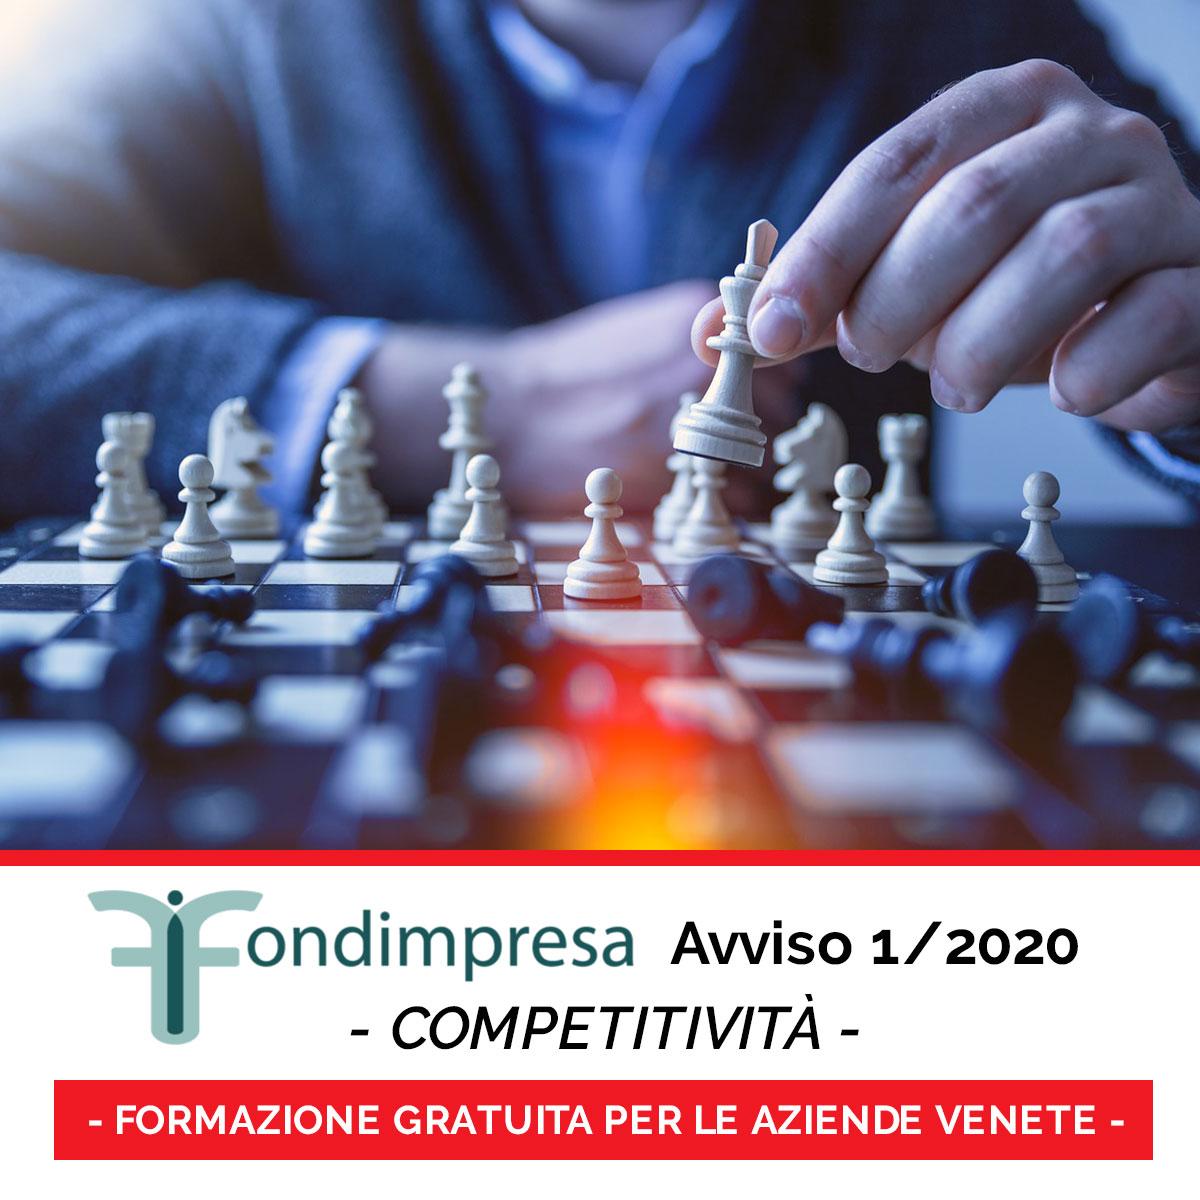 FONDIMPRESA-avviso-1-2020